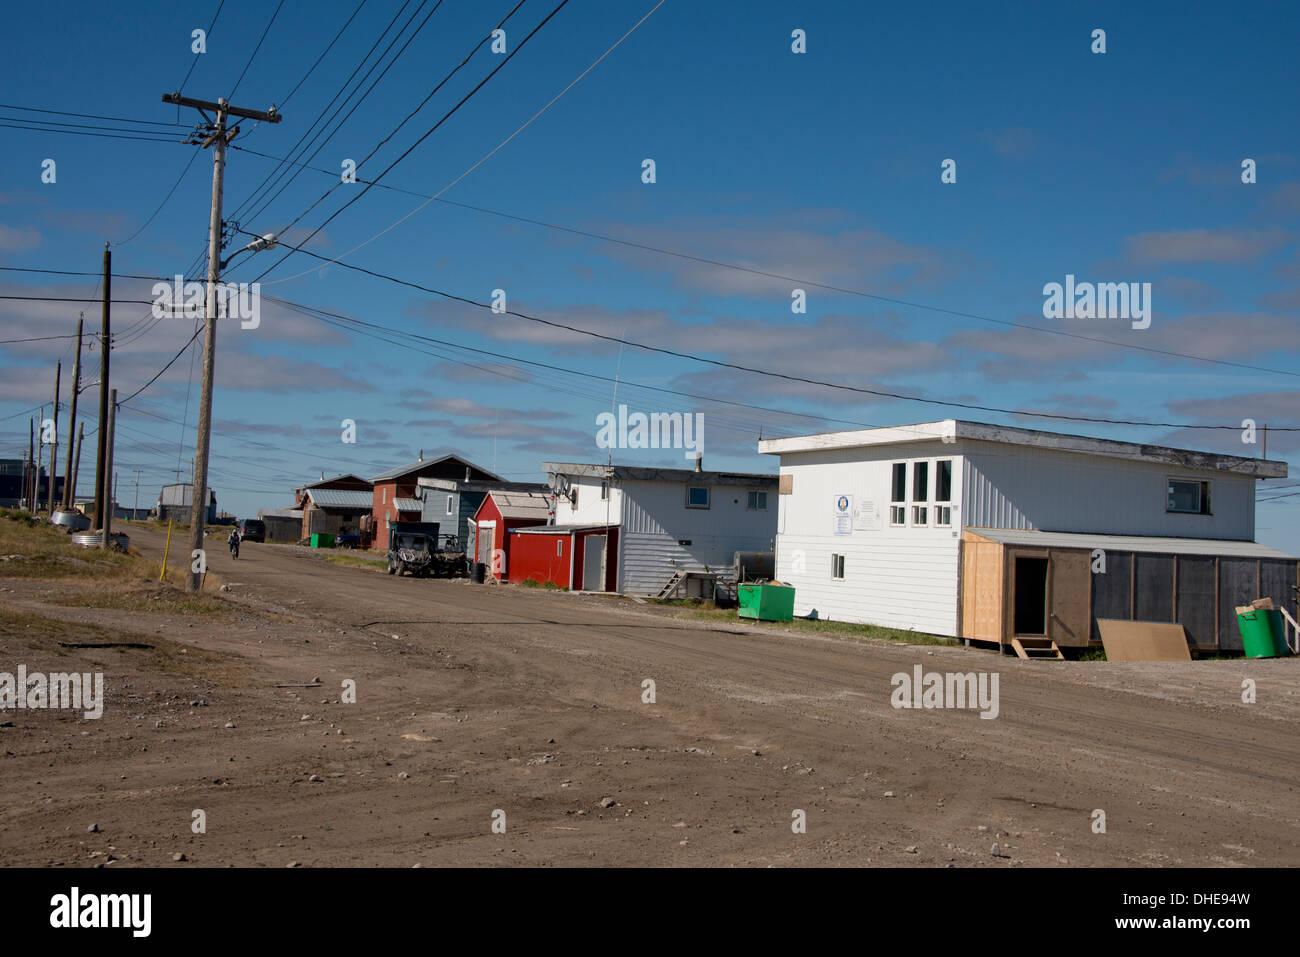 Canada, Nunavut, western shore of Hudson Bay, Kivalliq Region, Arviat. Typical northern community village. - Stock Image